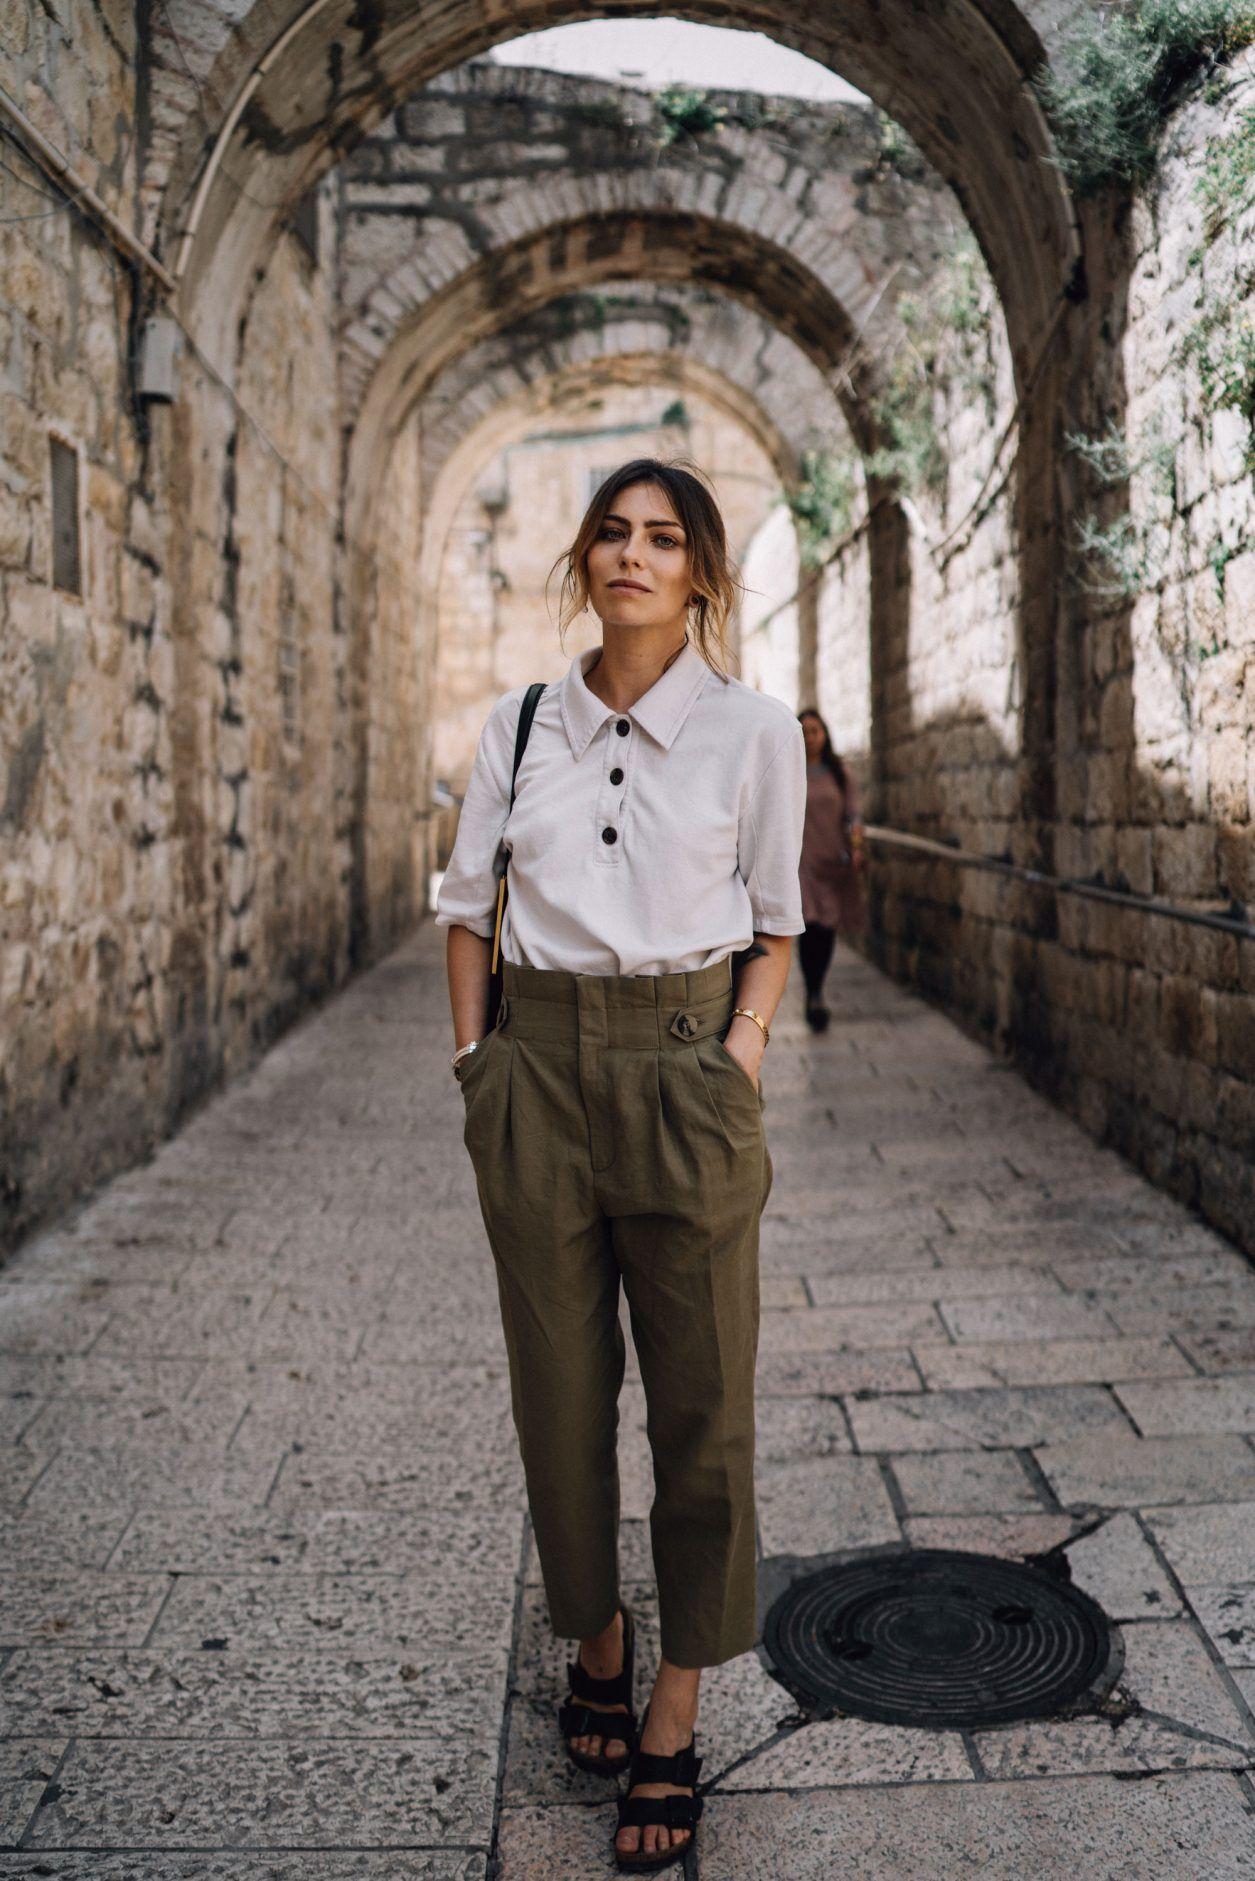 Street style by Masha Sedgwick | Berlin fashion blogger ...